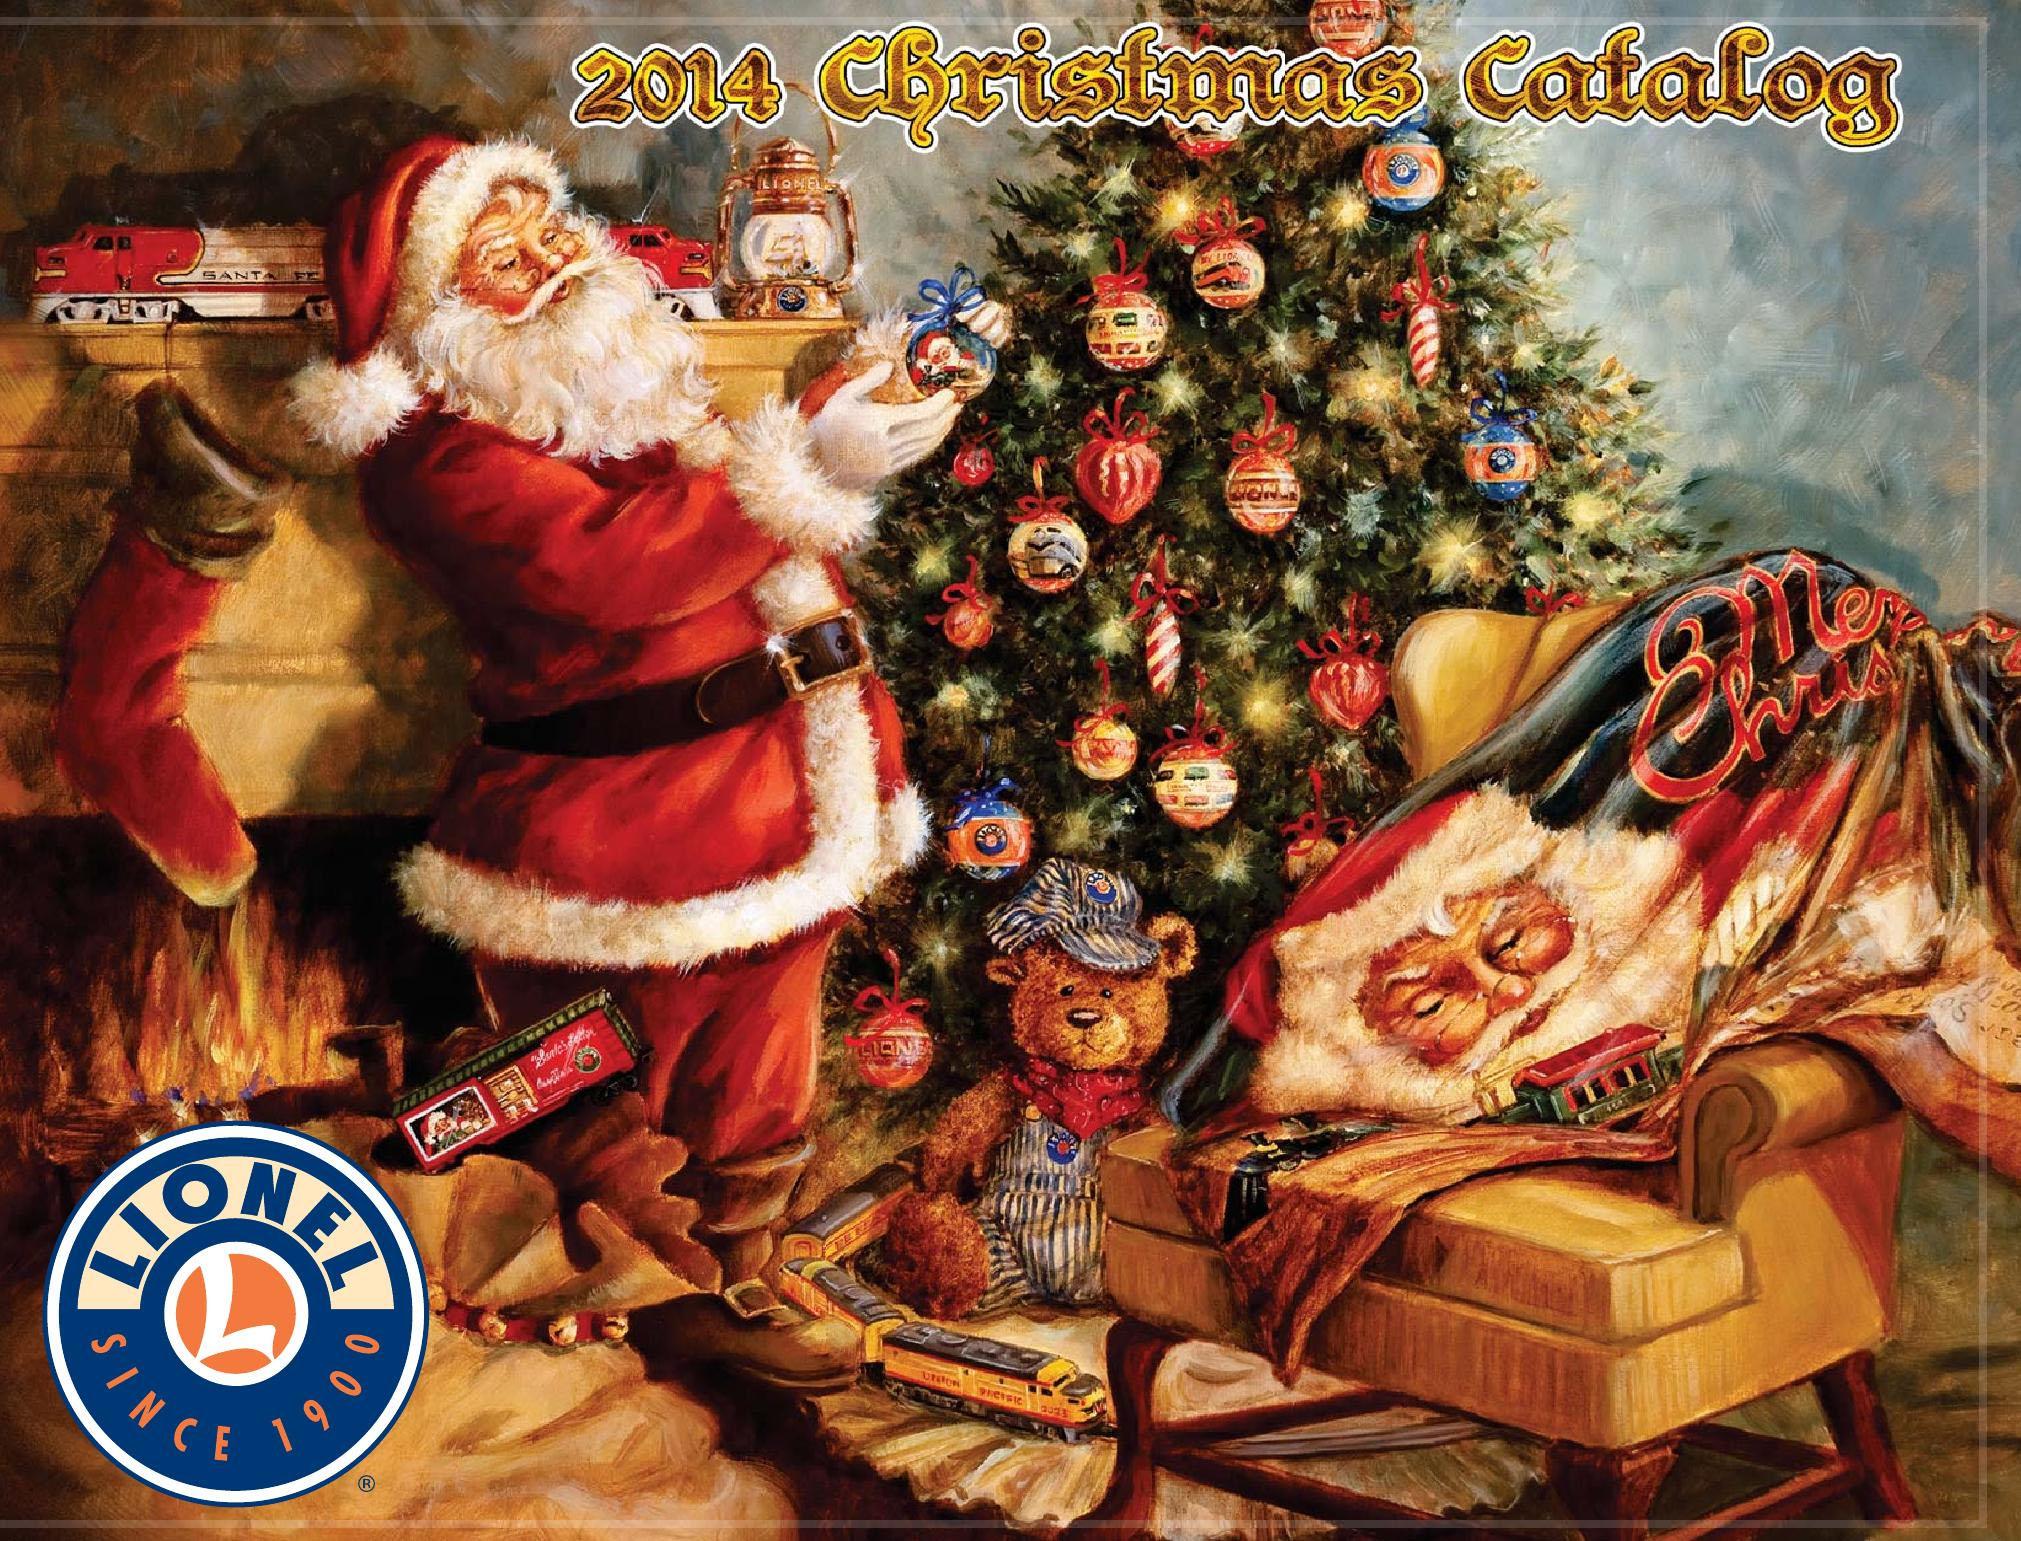 Lionel 2016 Christmas Catalog Train Engine Locomotive